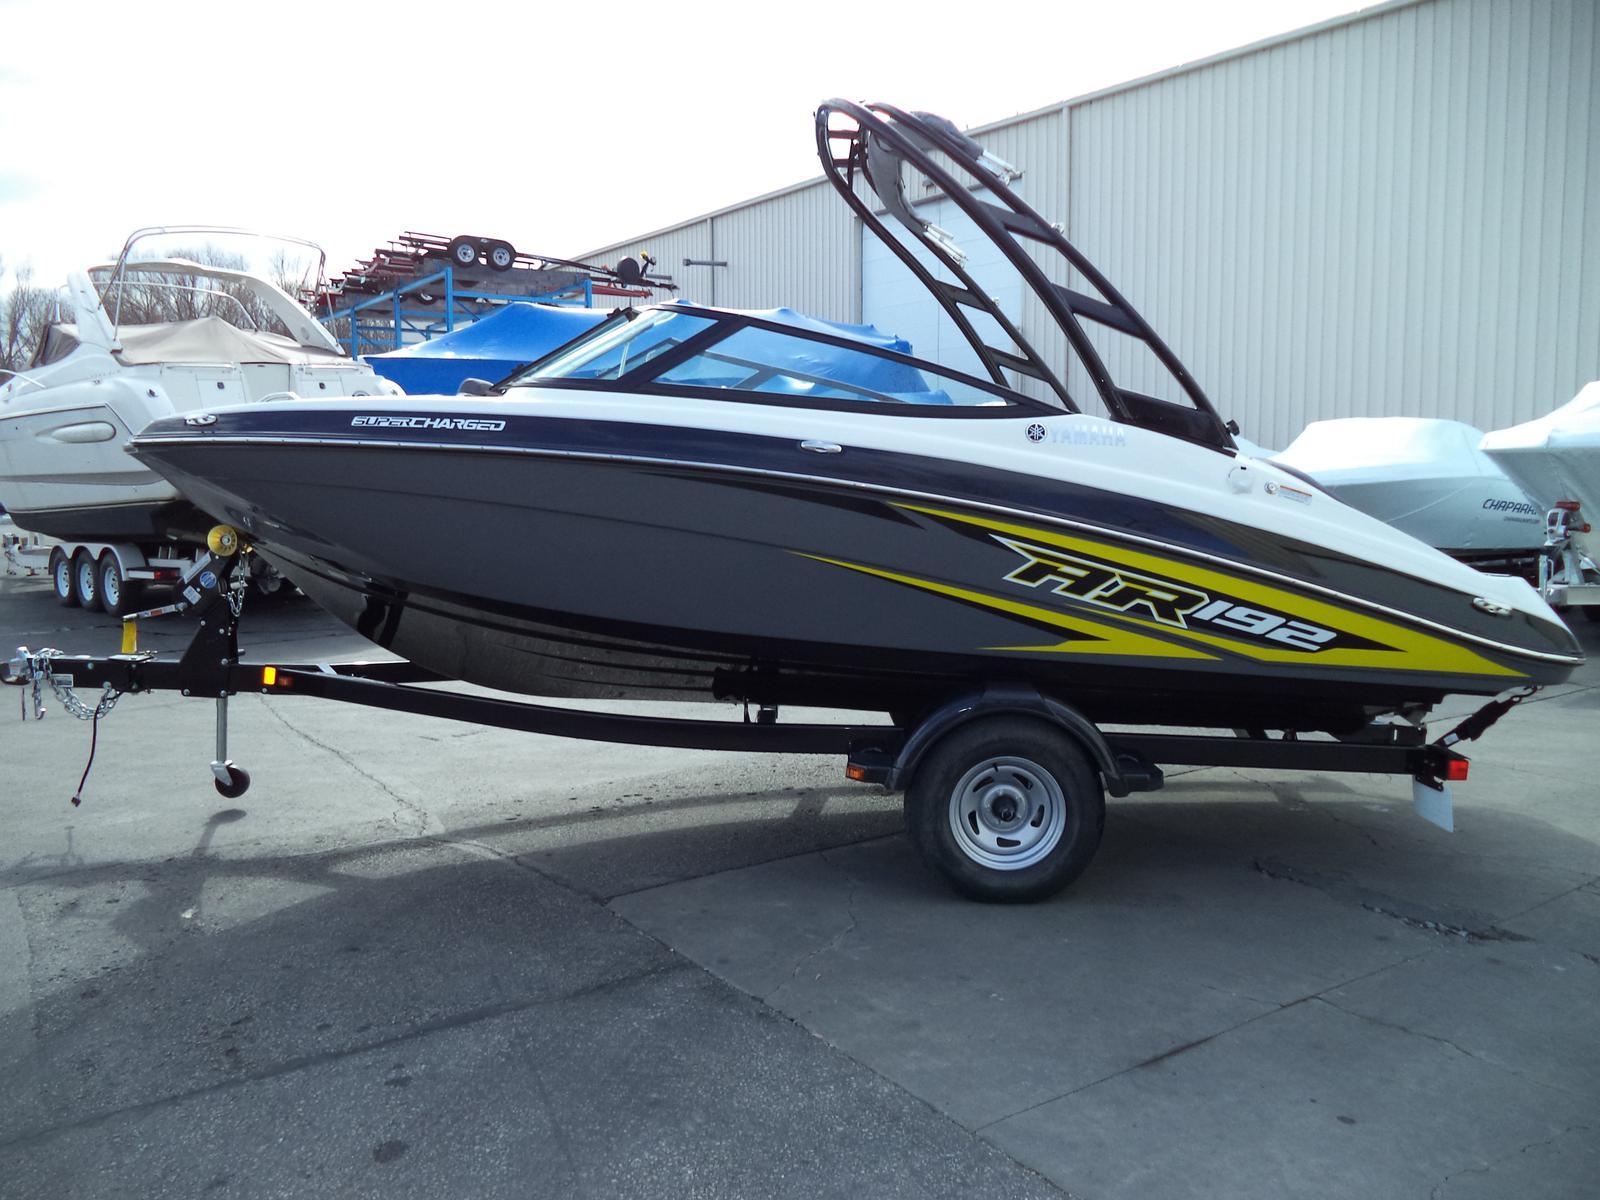 2016 Yamaha Ar 192 19 Foot 2016 Yamaha Ar Motor Boat In